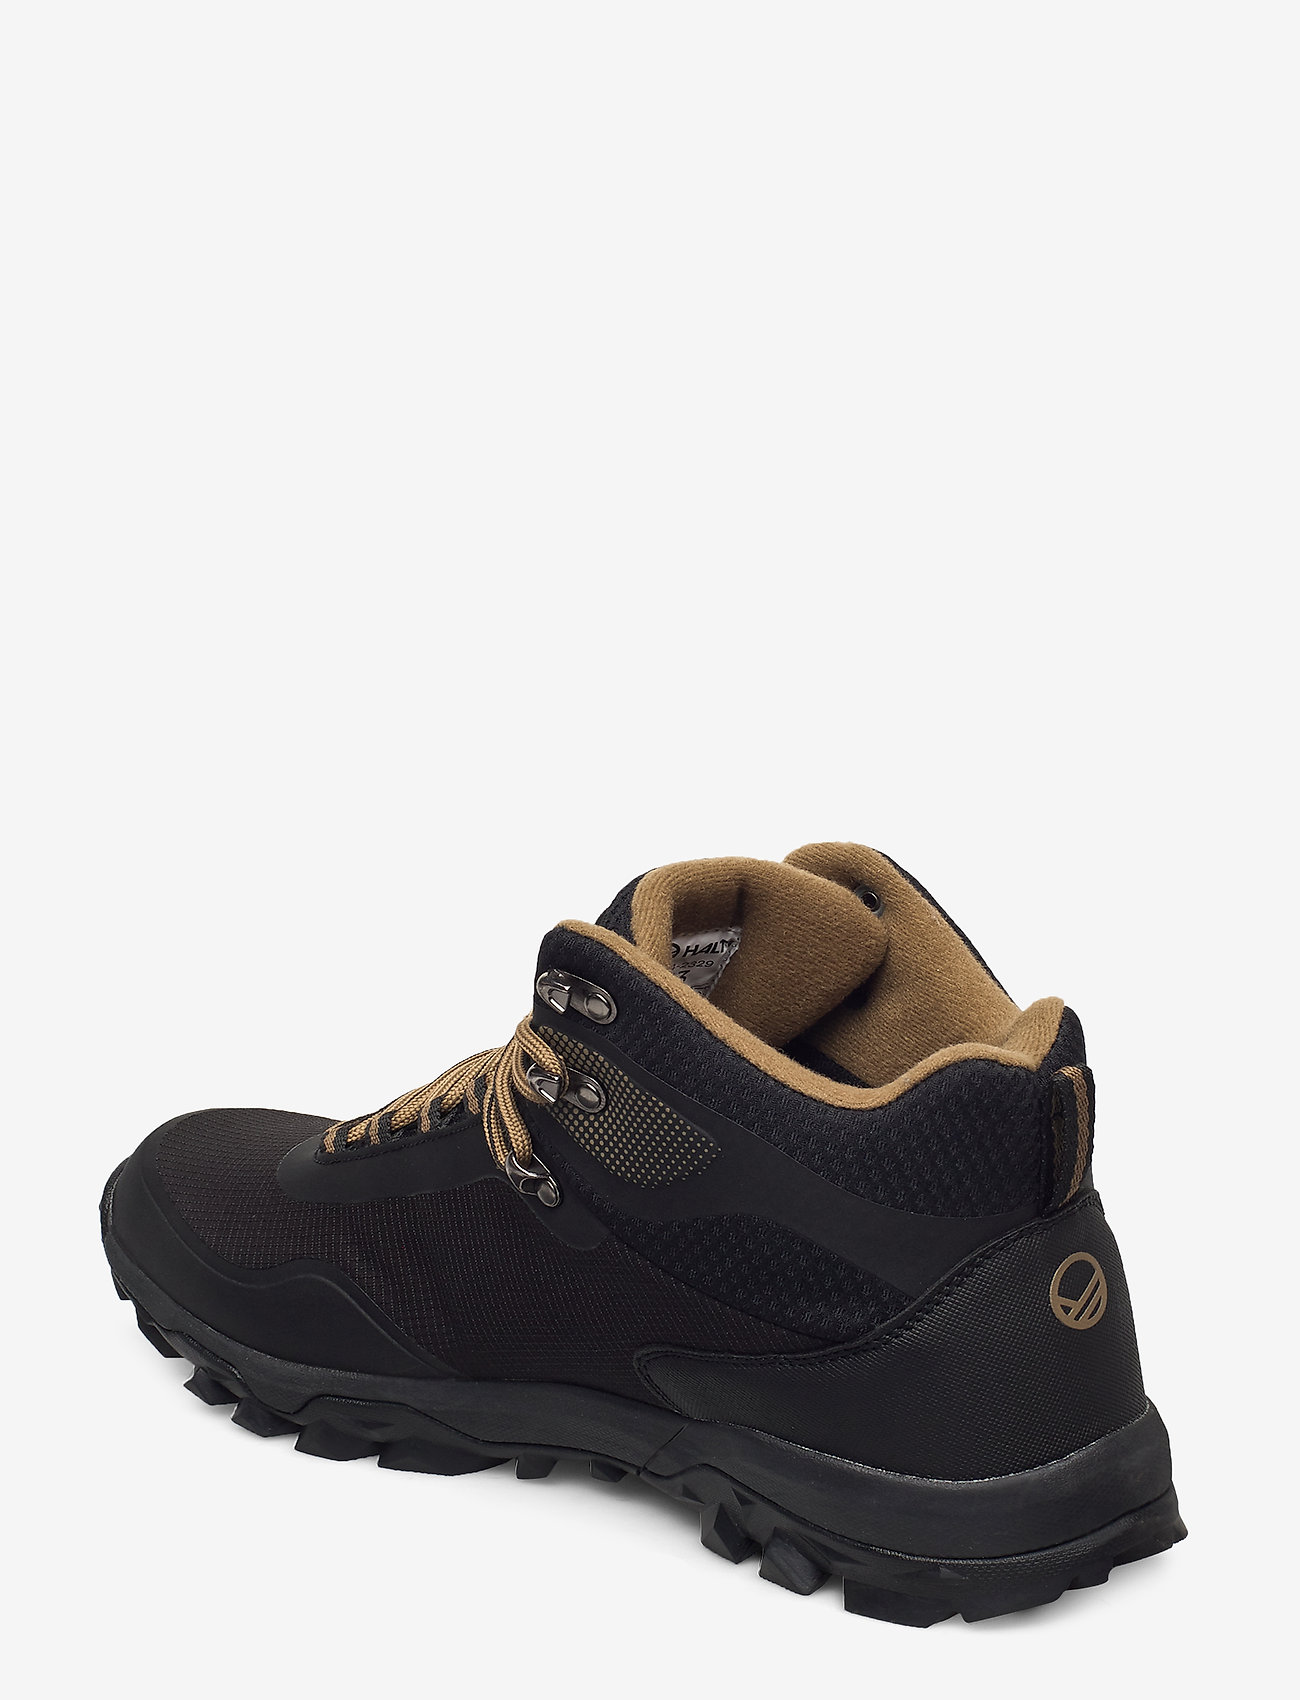 Fara Men's Mid Drymaxx Outdoor Shoes (Black/khaki) (99.90 €) - Halti fgGmq